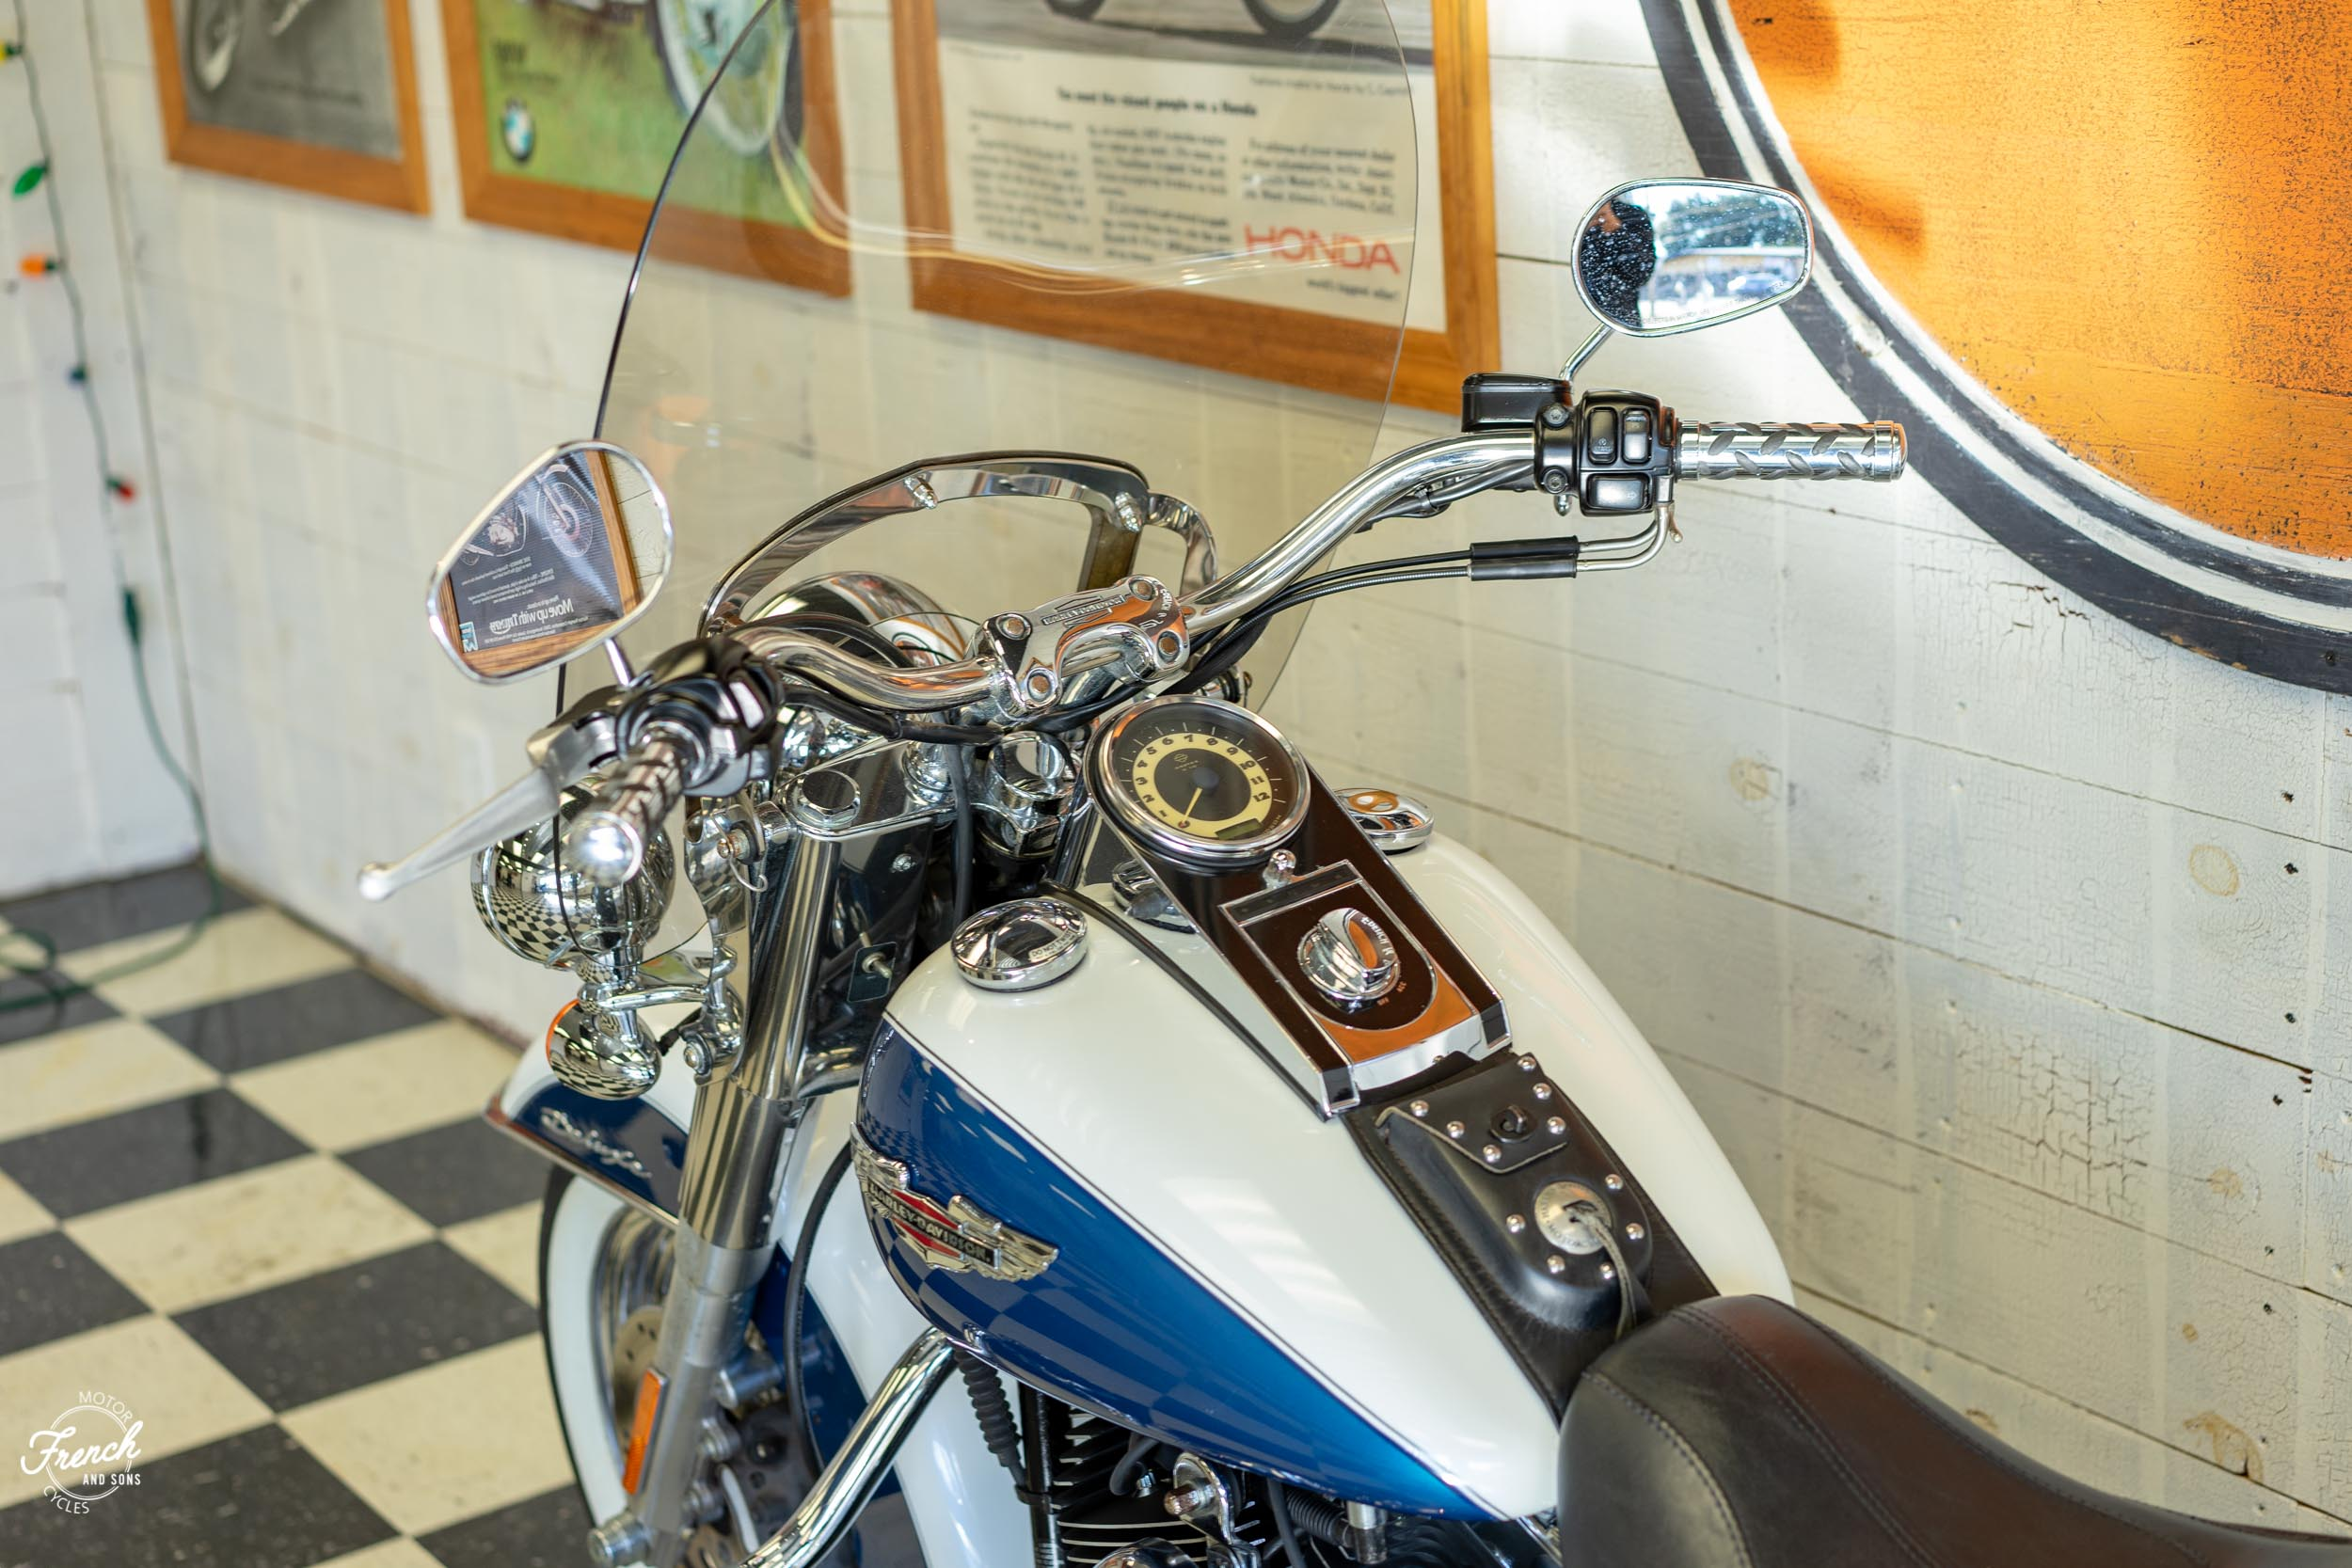 2005_Harley_Davidson_Softail_Deluxe-24.jpg